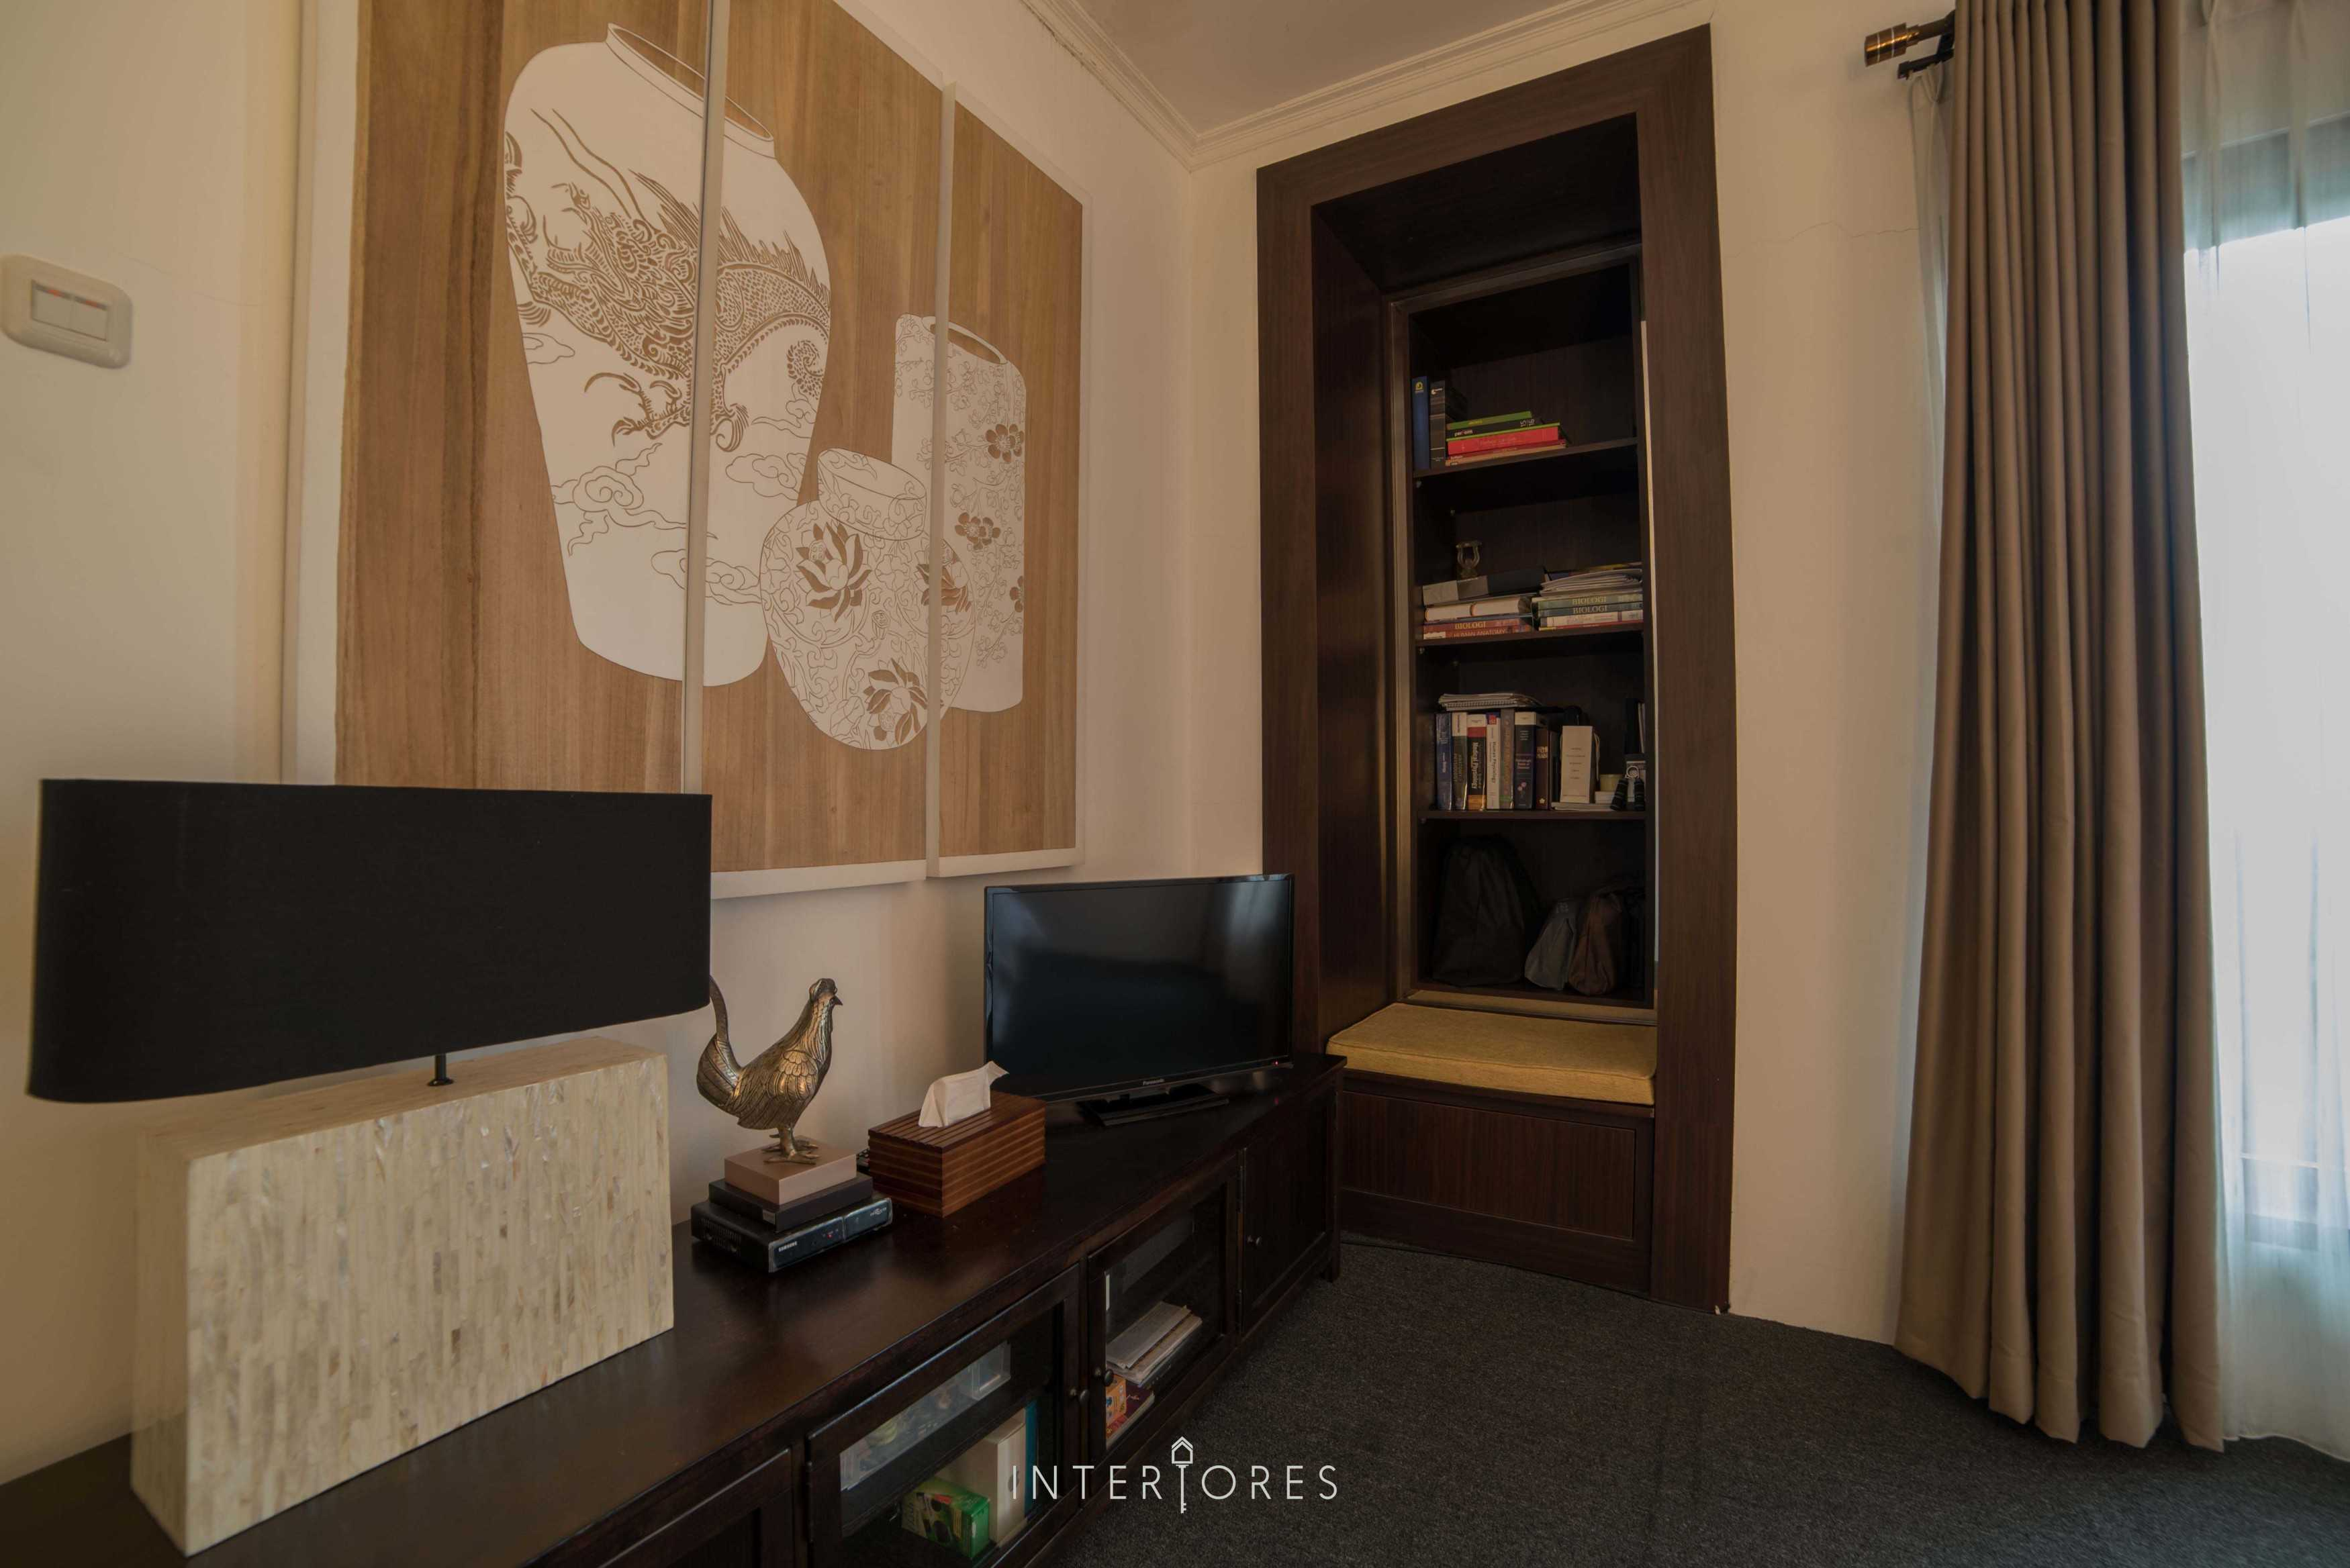 Interiores Interior Consultant & Build Greta 90 Bintaro Bintaro Tv And Rack Kontemporer  17680